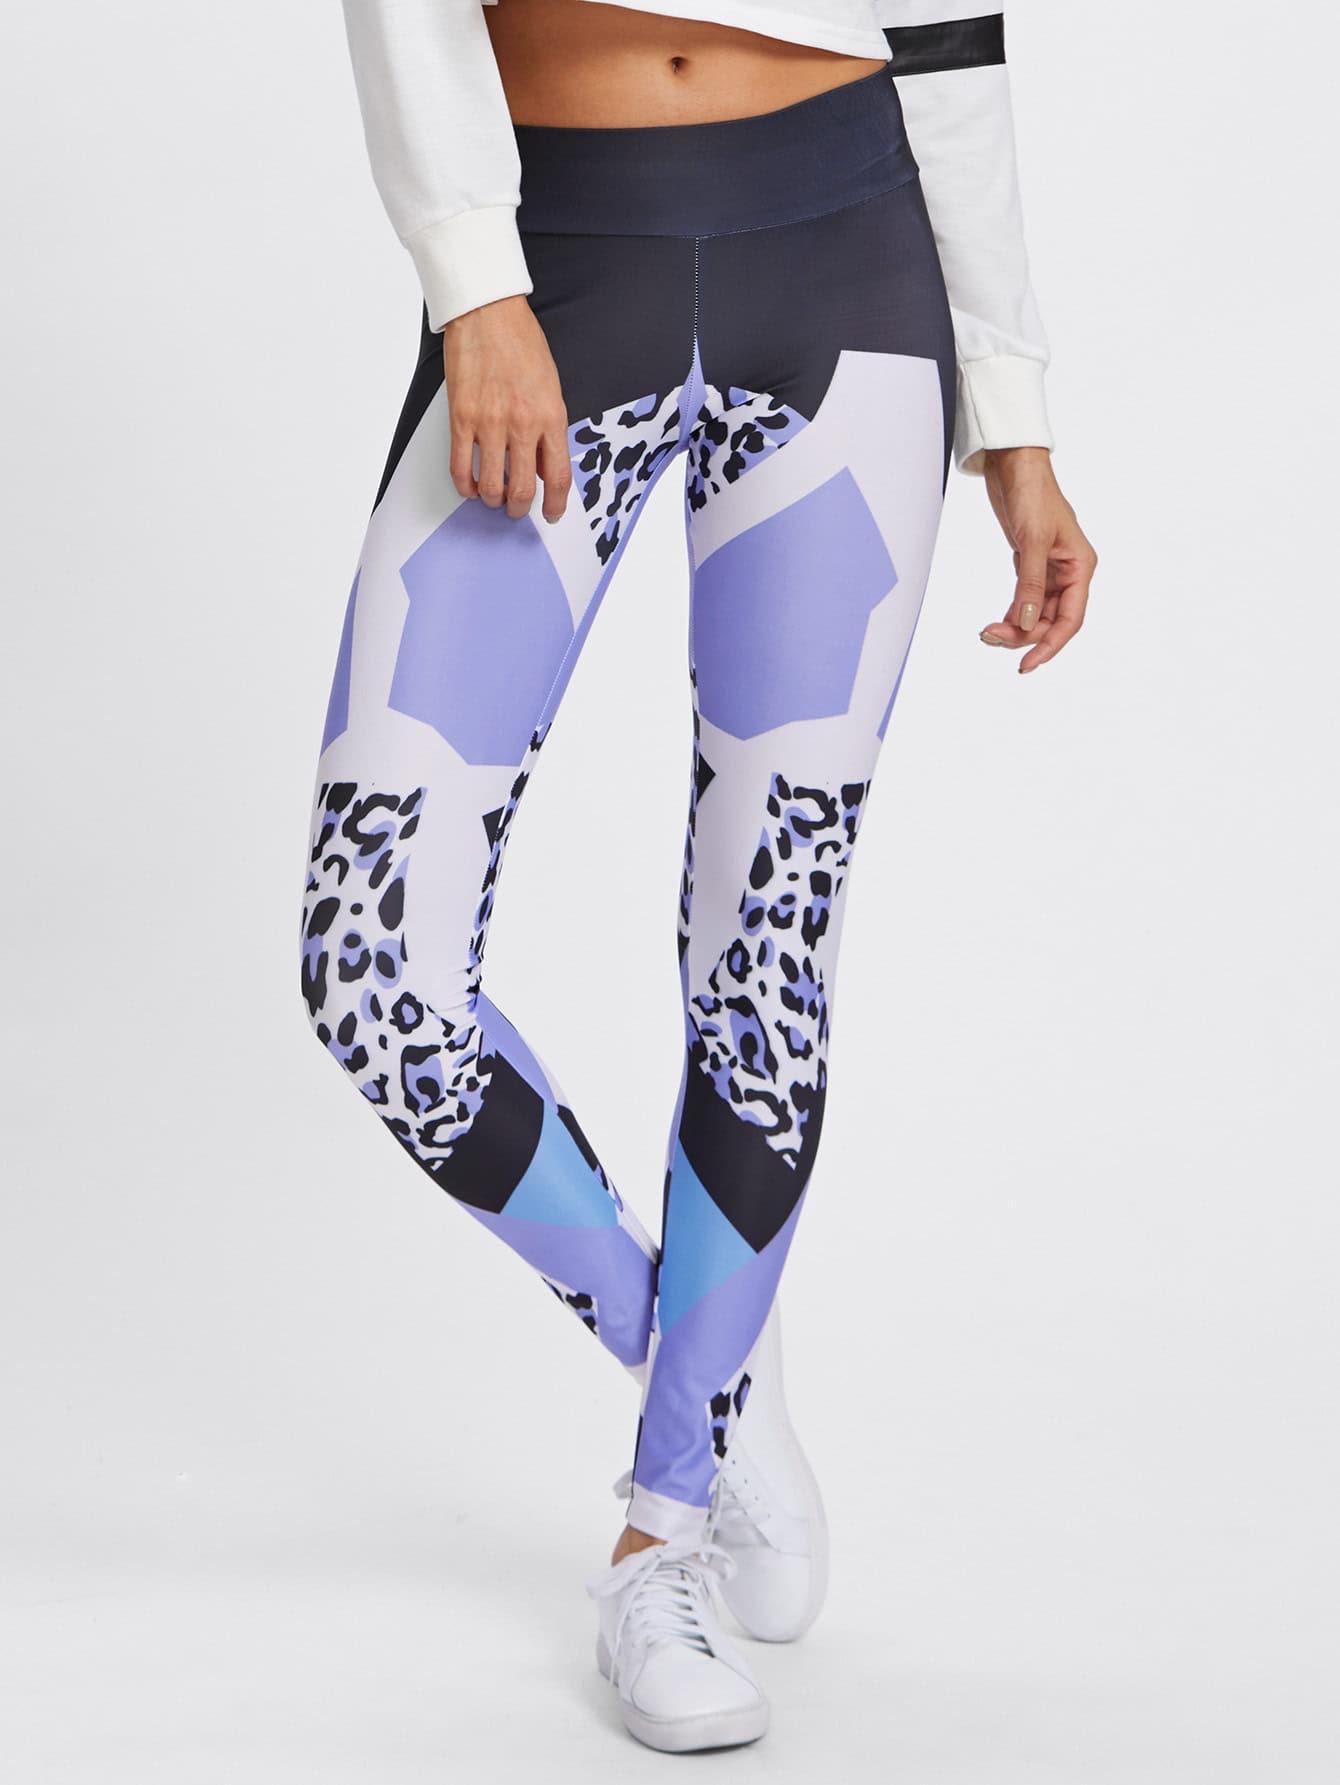 Wide Waistband Mixed Print Leggings knit wide waistband leggings